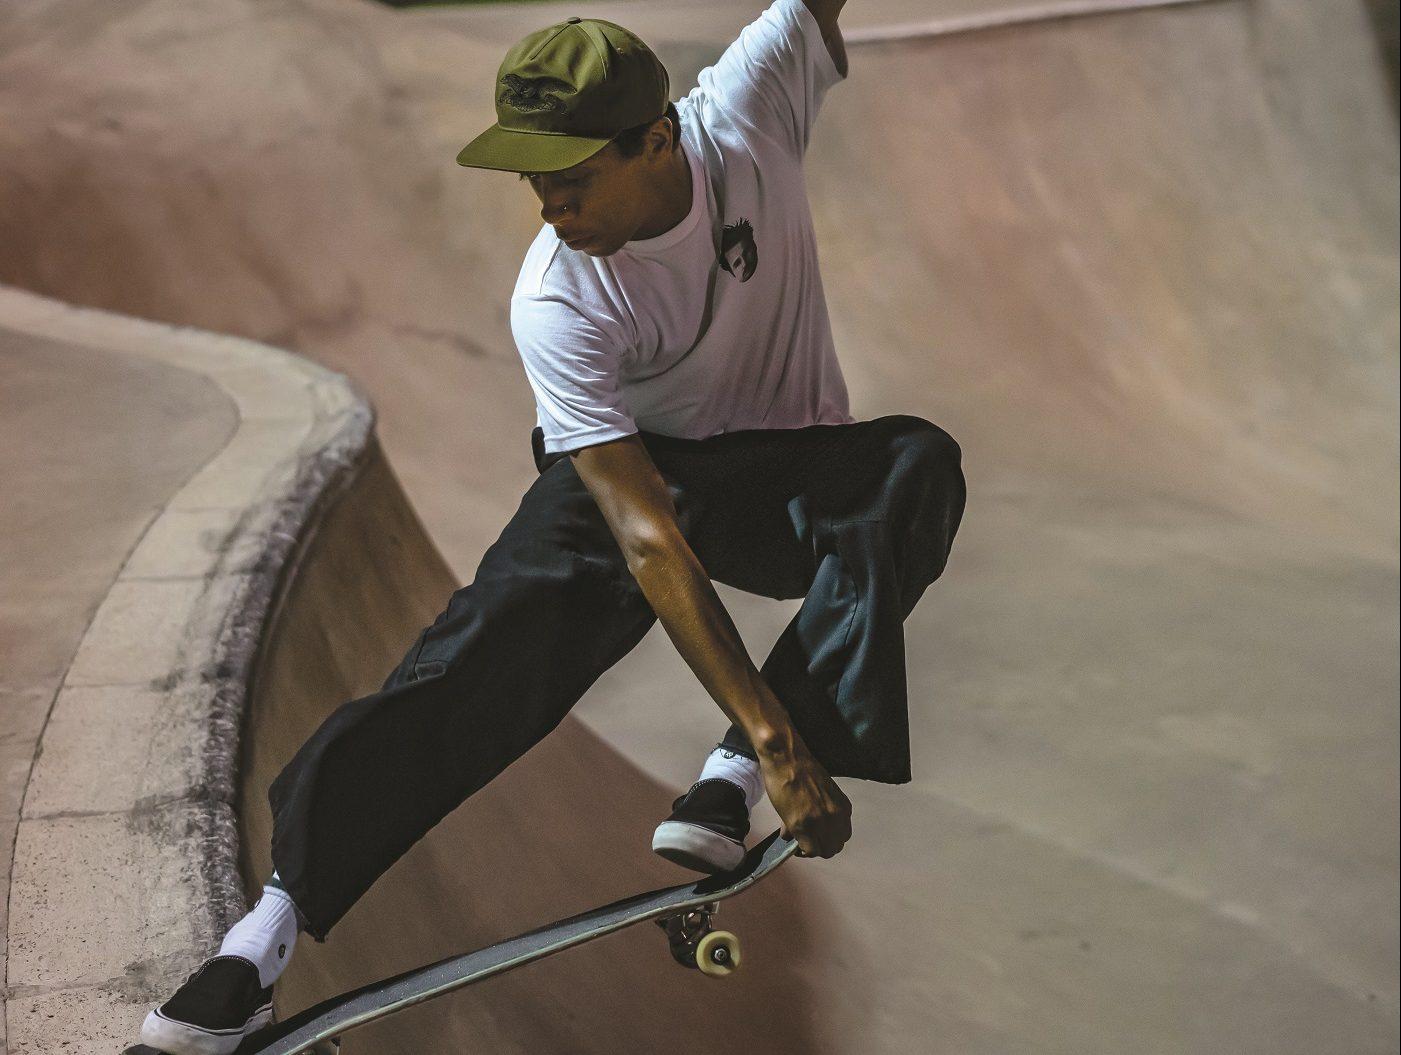 John Quezada – Crailslide – South Jordan Skatepark